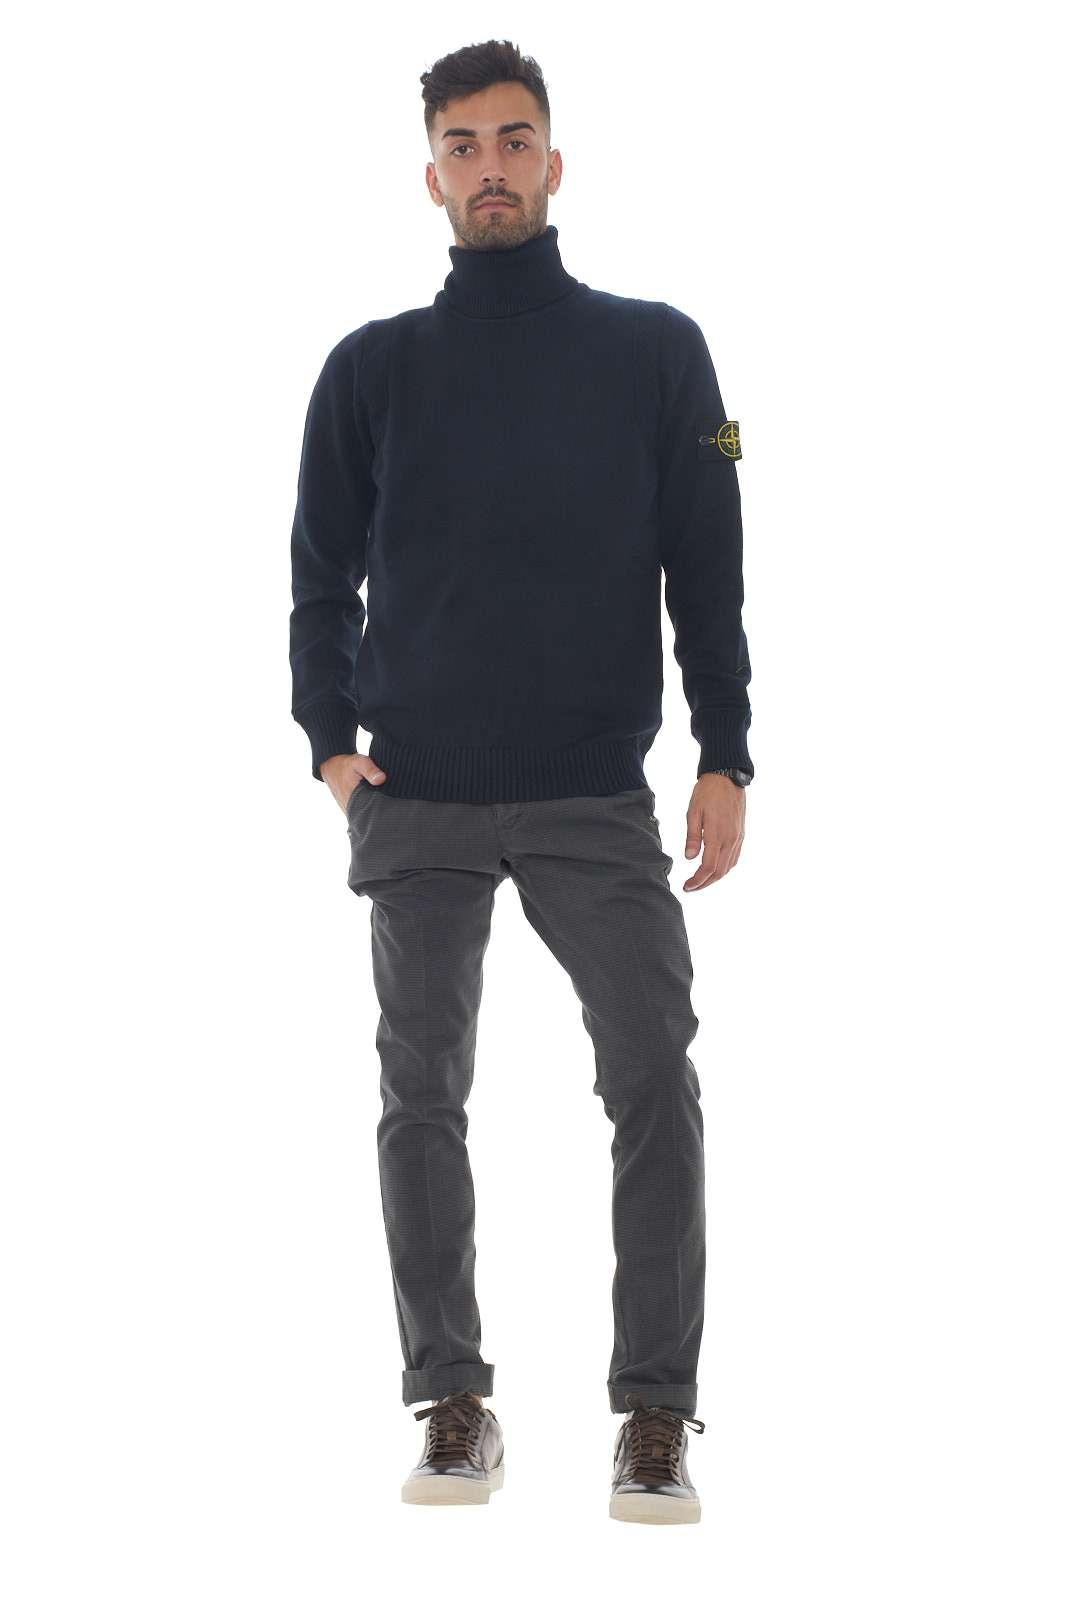 https://www.parmax.com/media/catalog/product/a/i/AI-outlet_parmax-pantaloni-uomo-Entre-Amis-A208358%201788-D.jpg